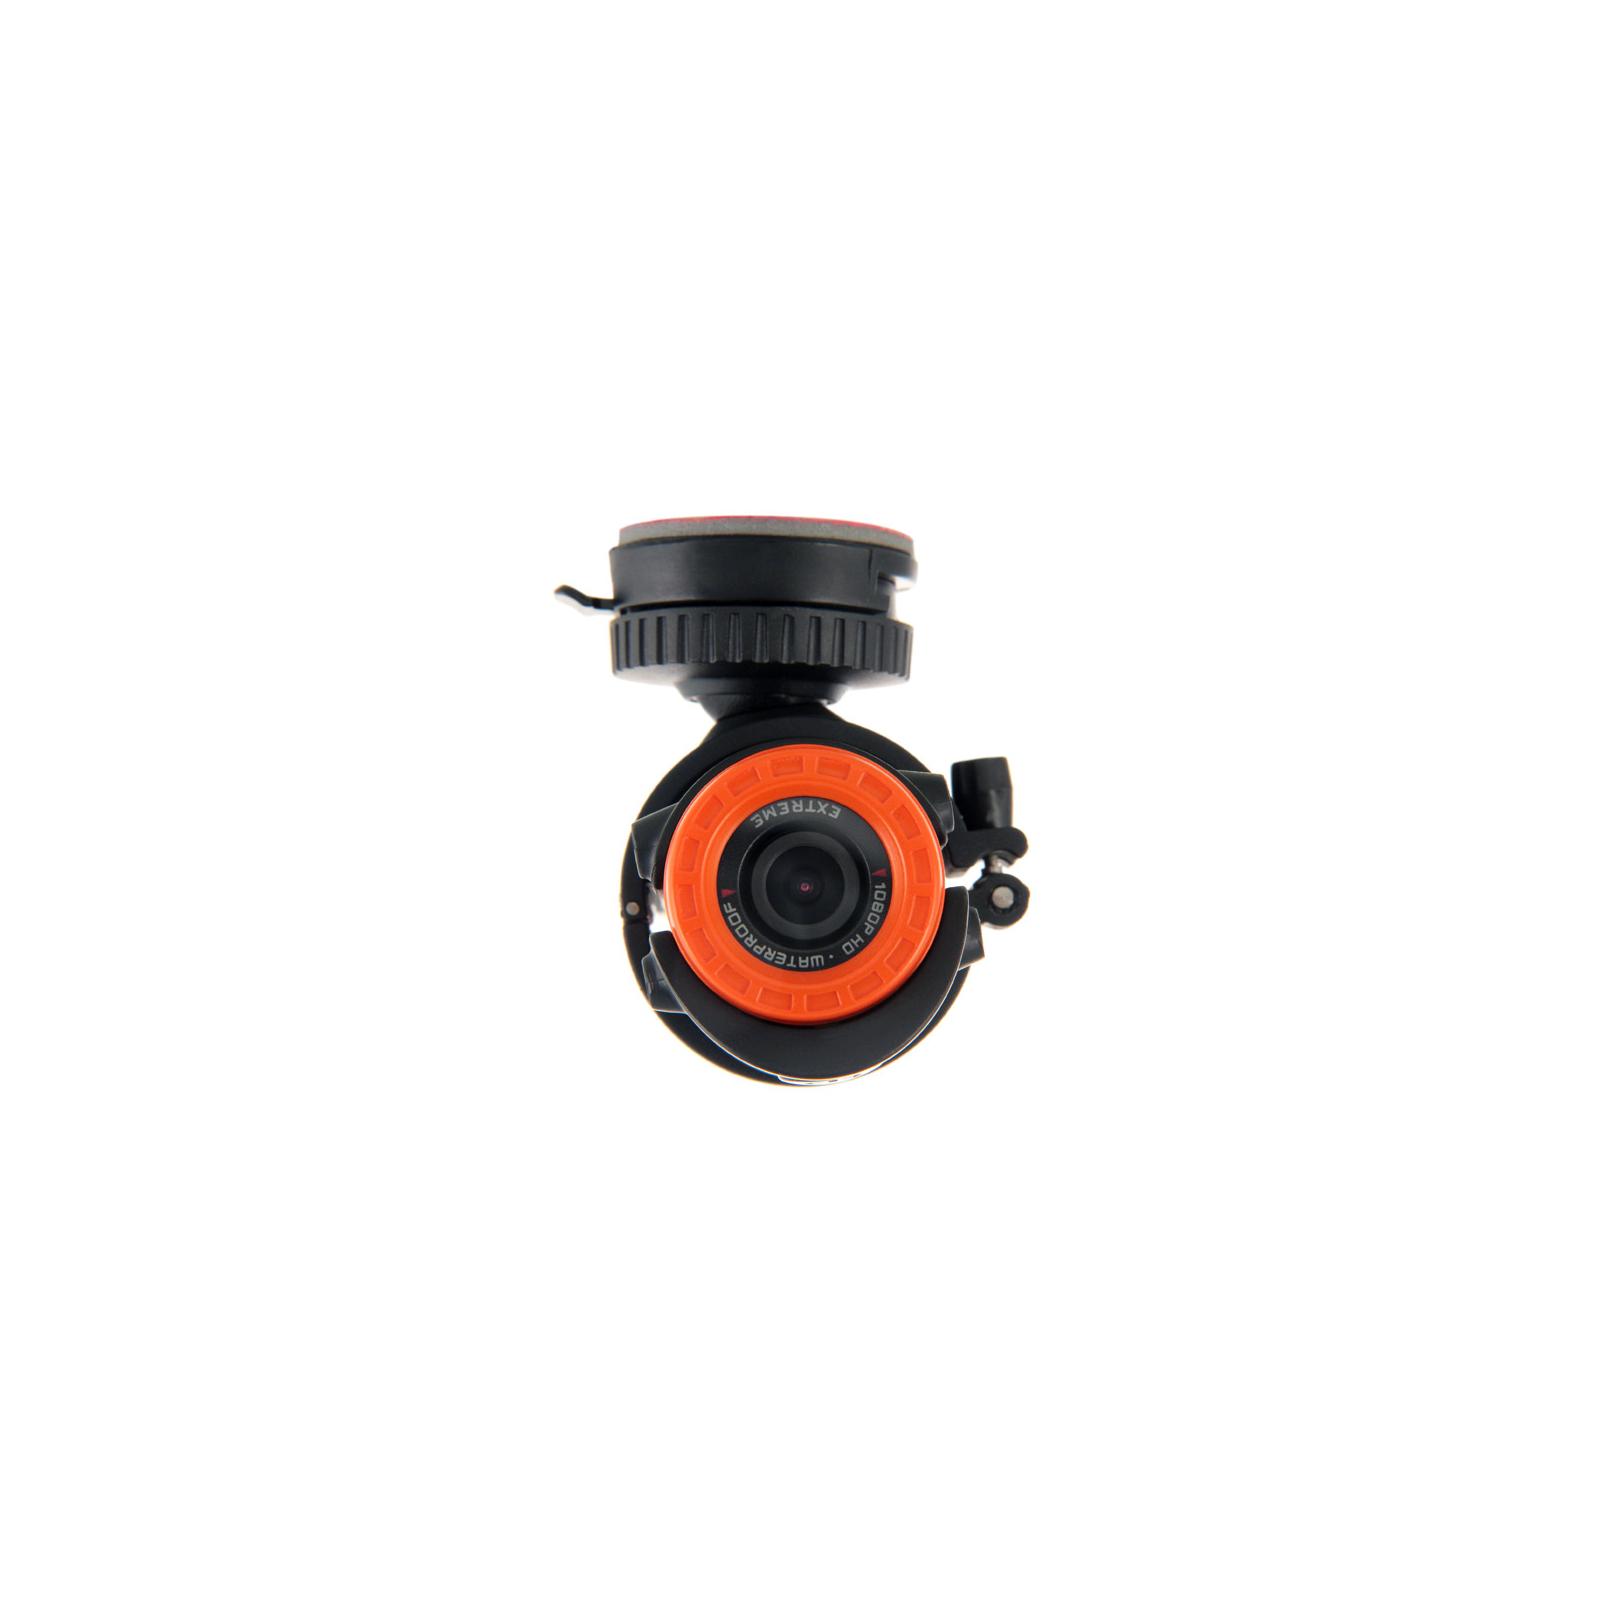 Экшн-камера MIO MiVue M300 изображение 6